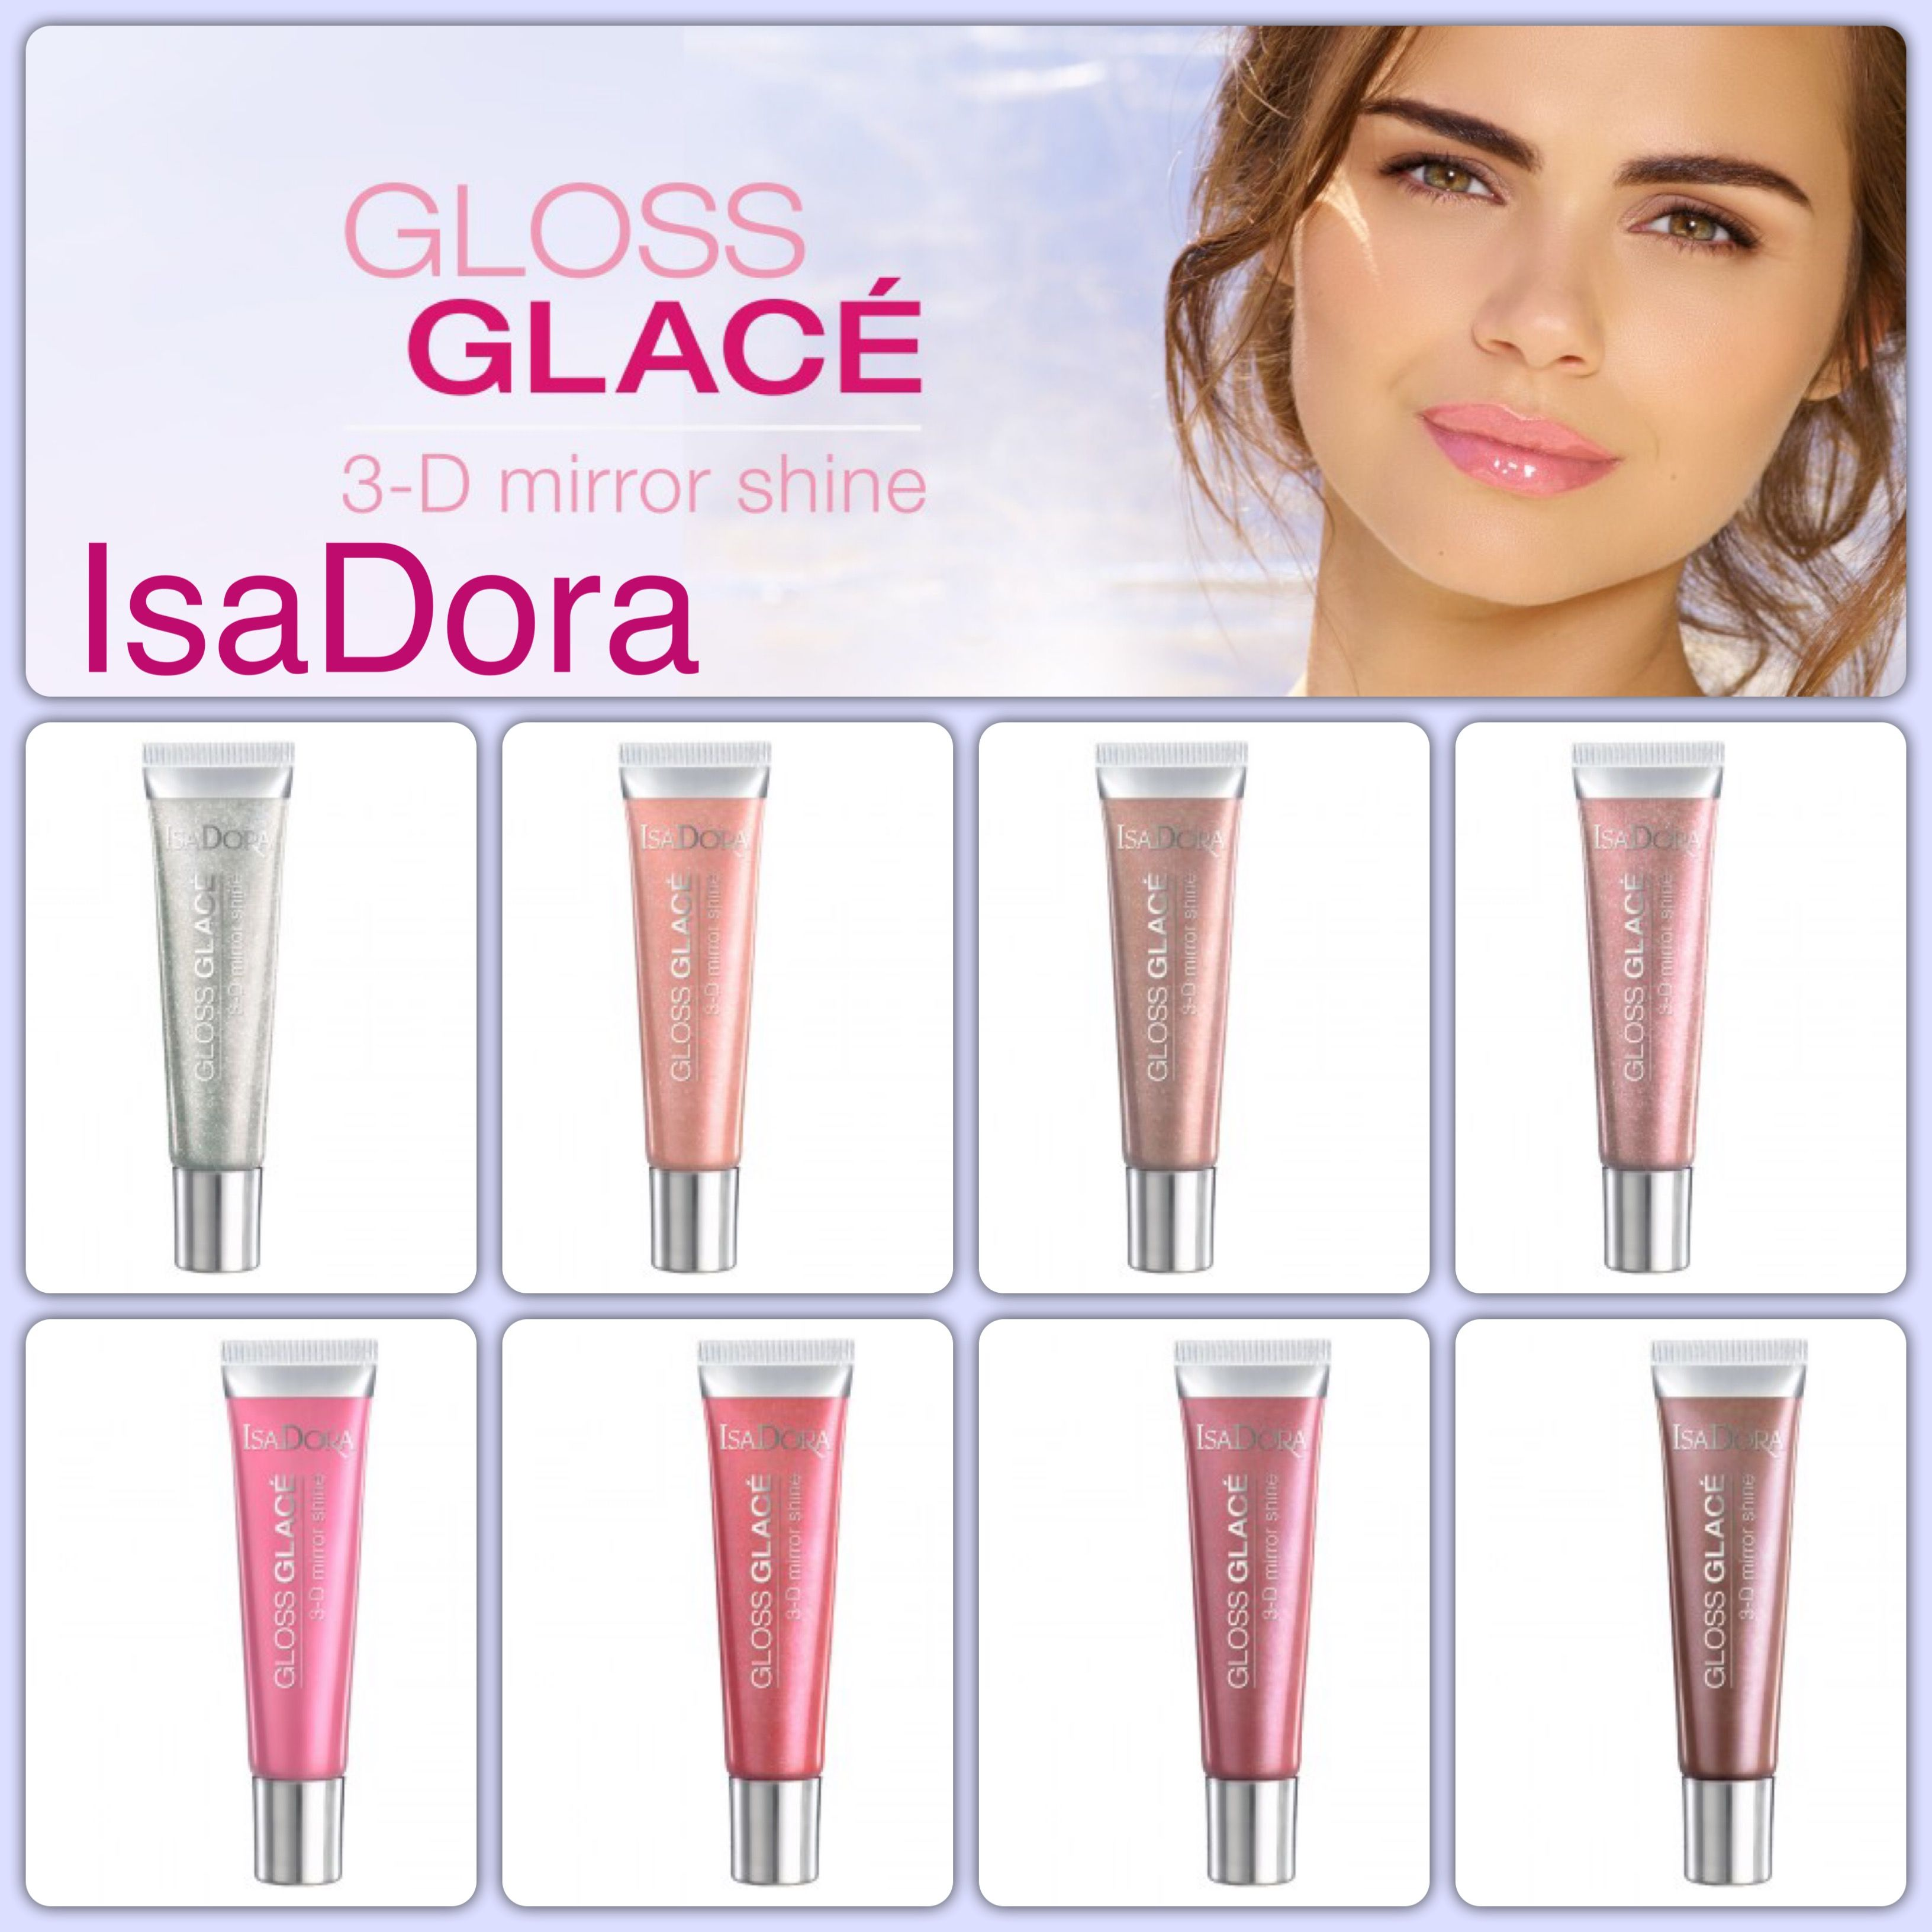 gloss glace isadora